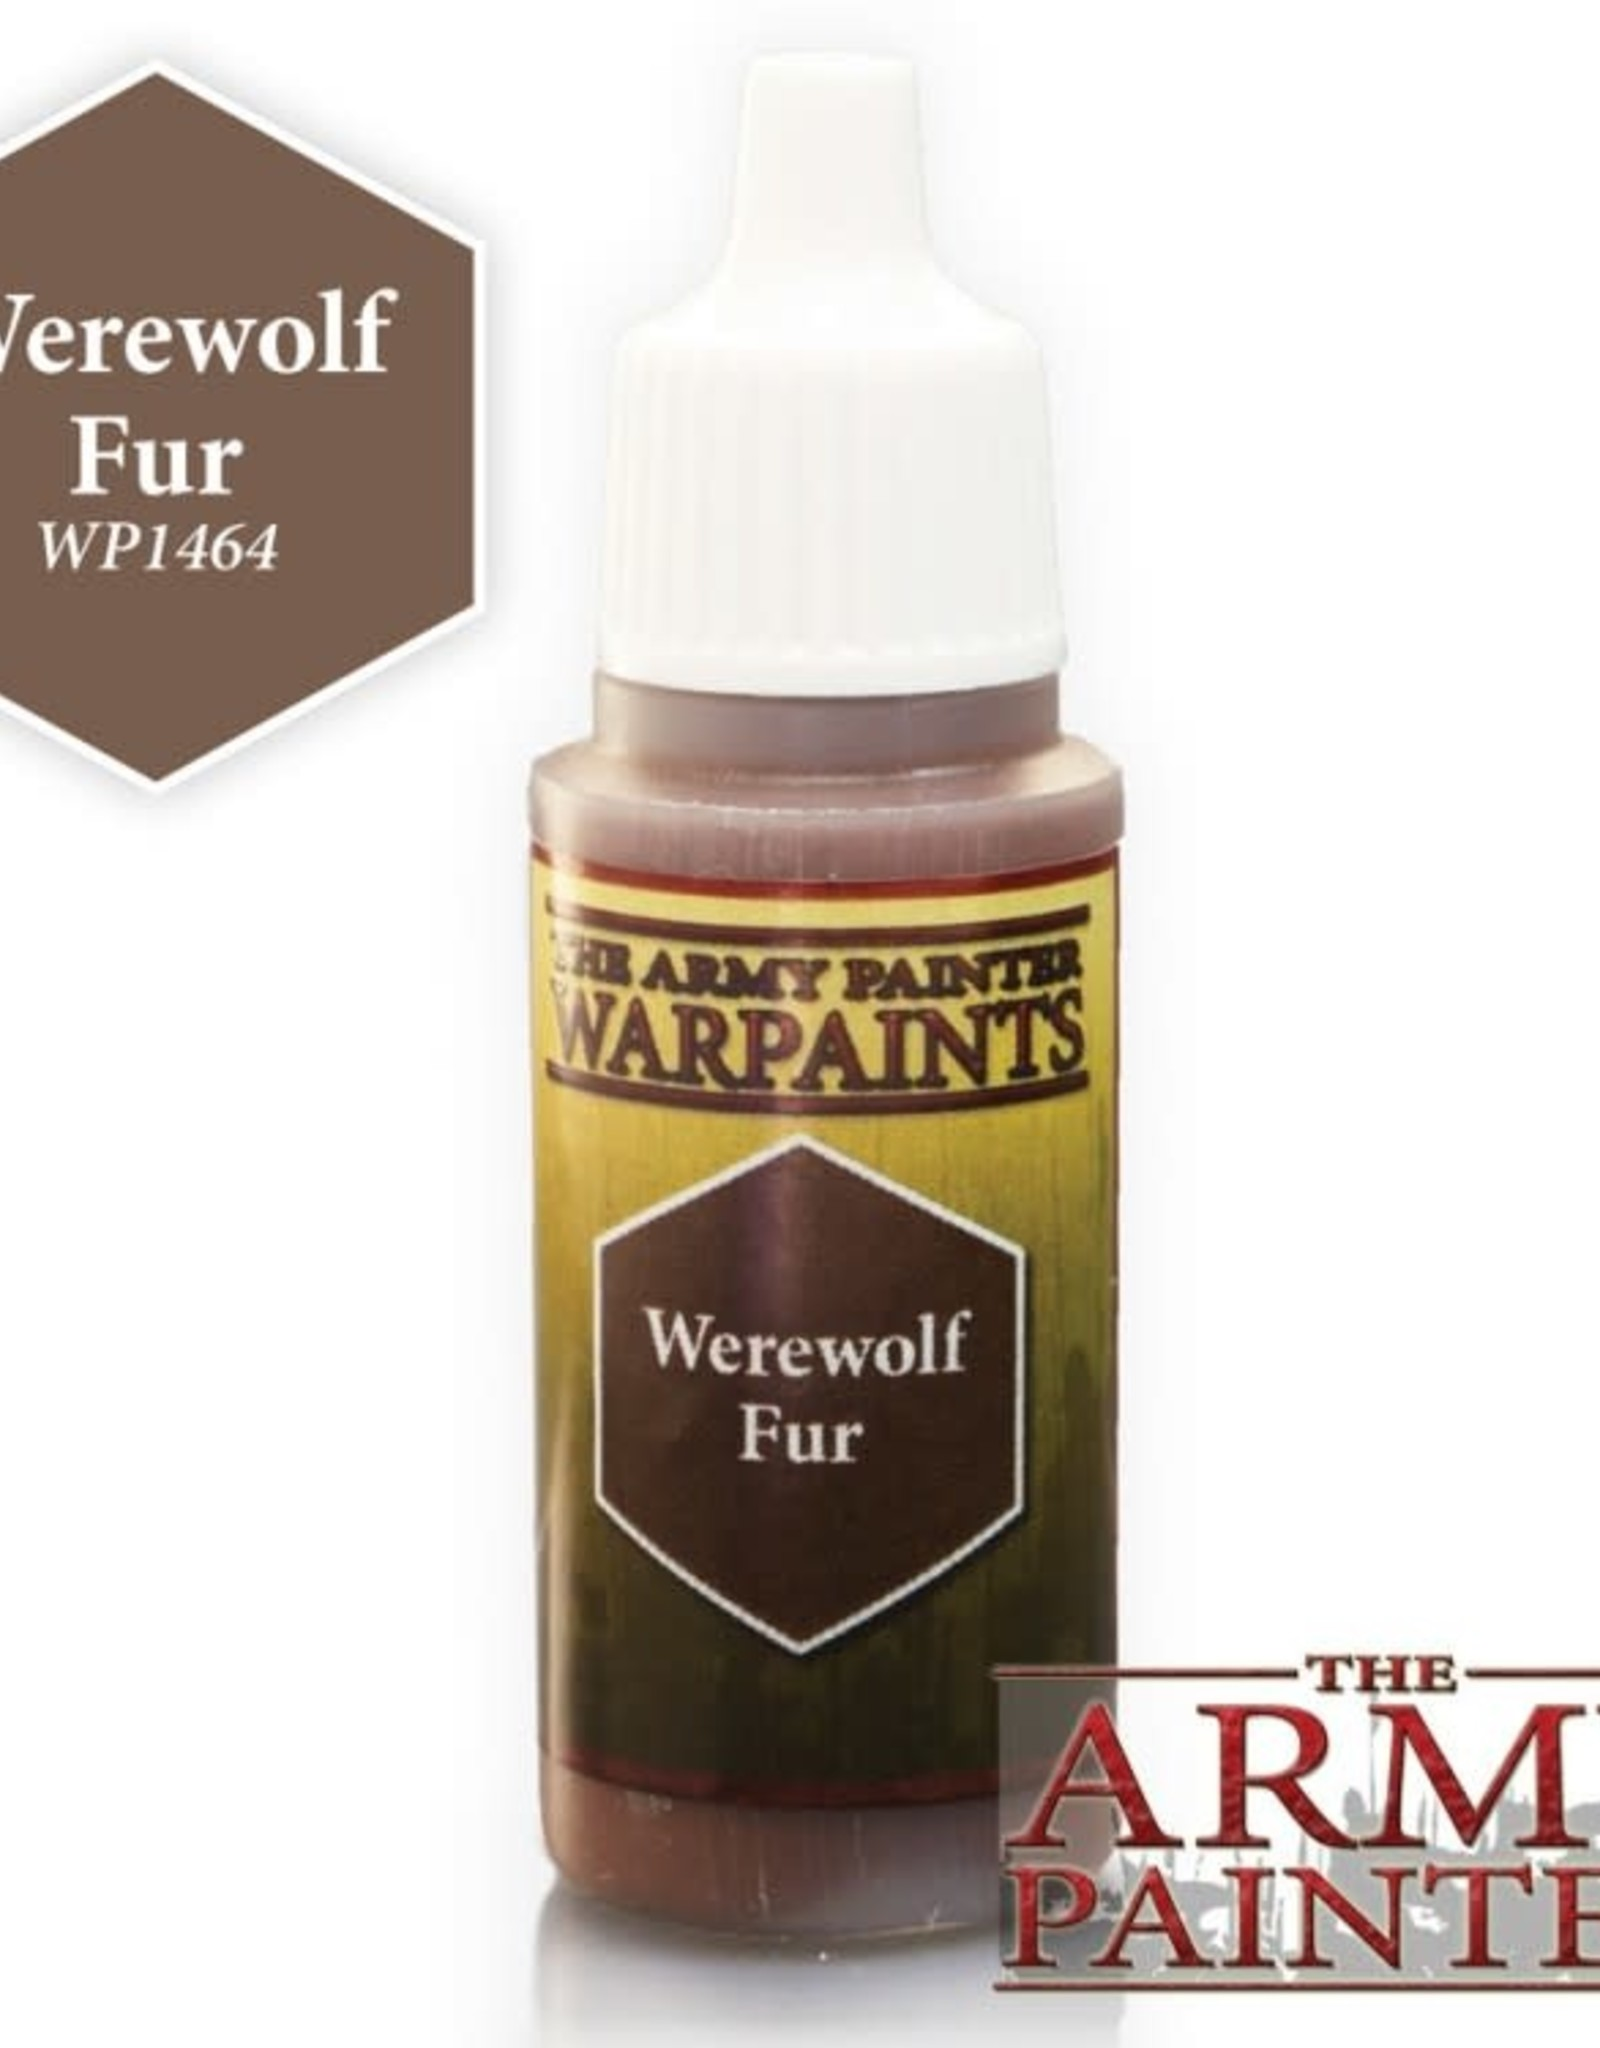 The Army Painter Warpaints - Werewolf Fur